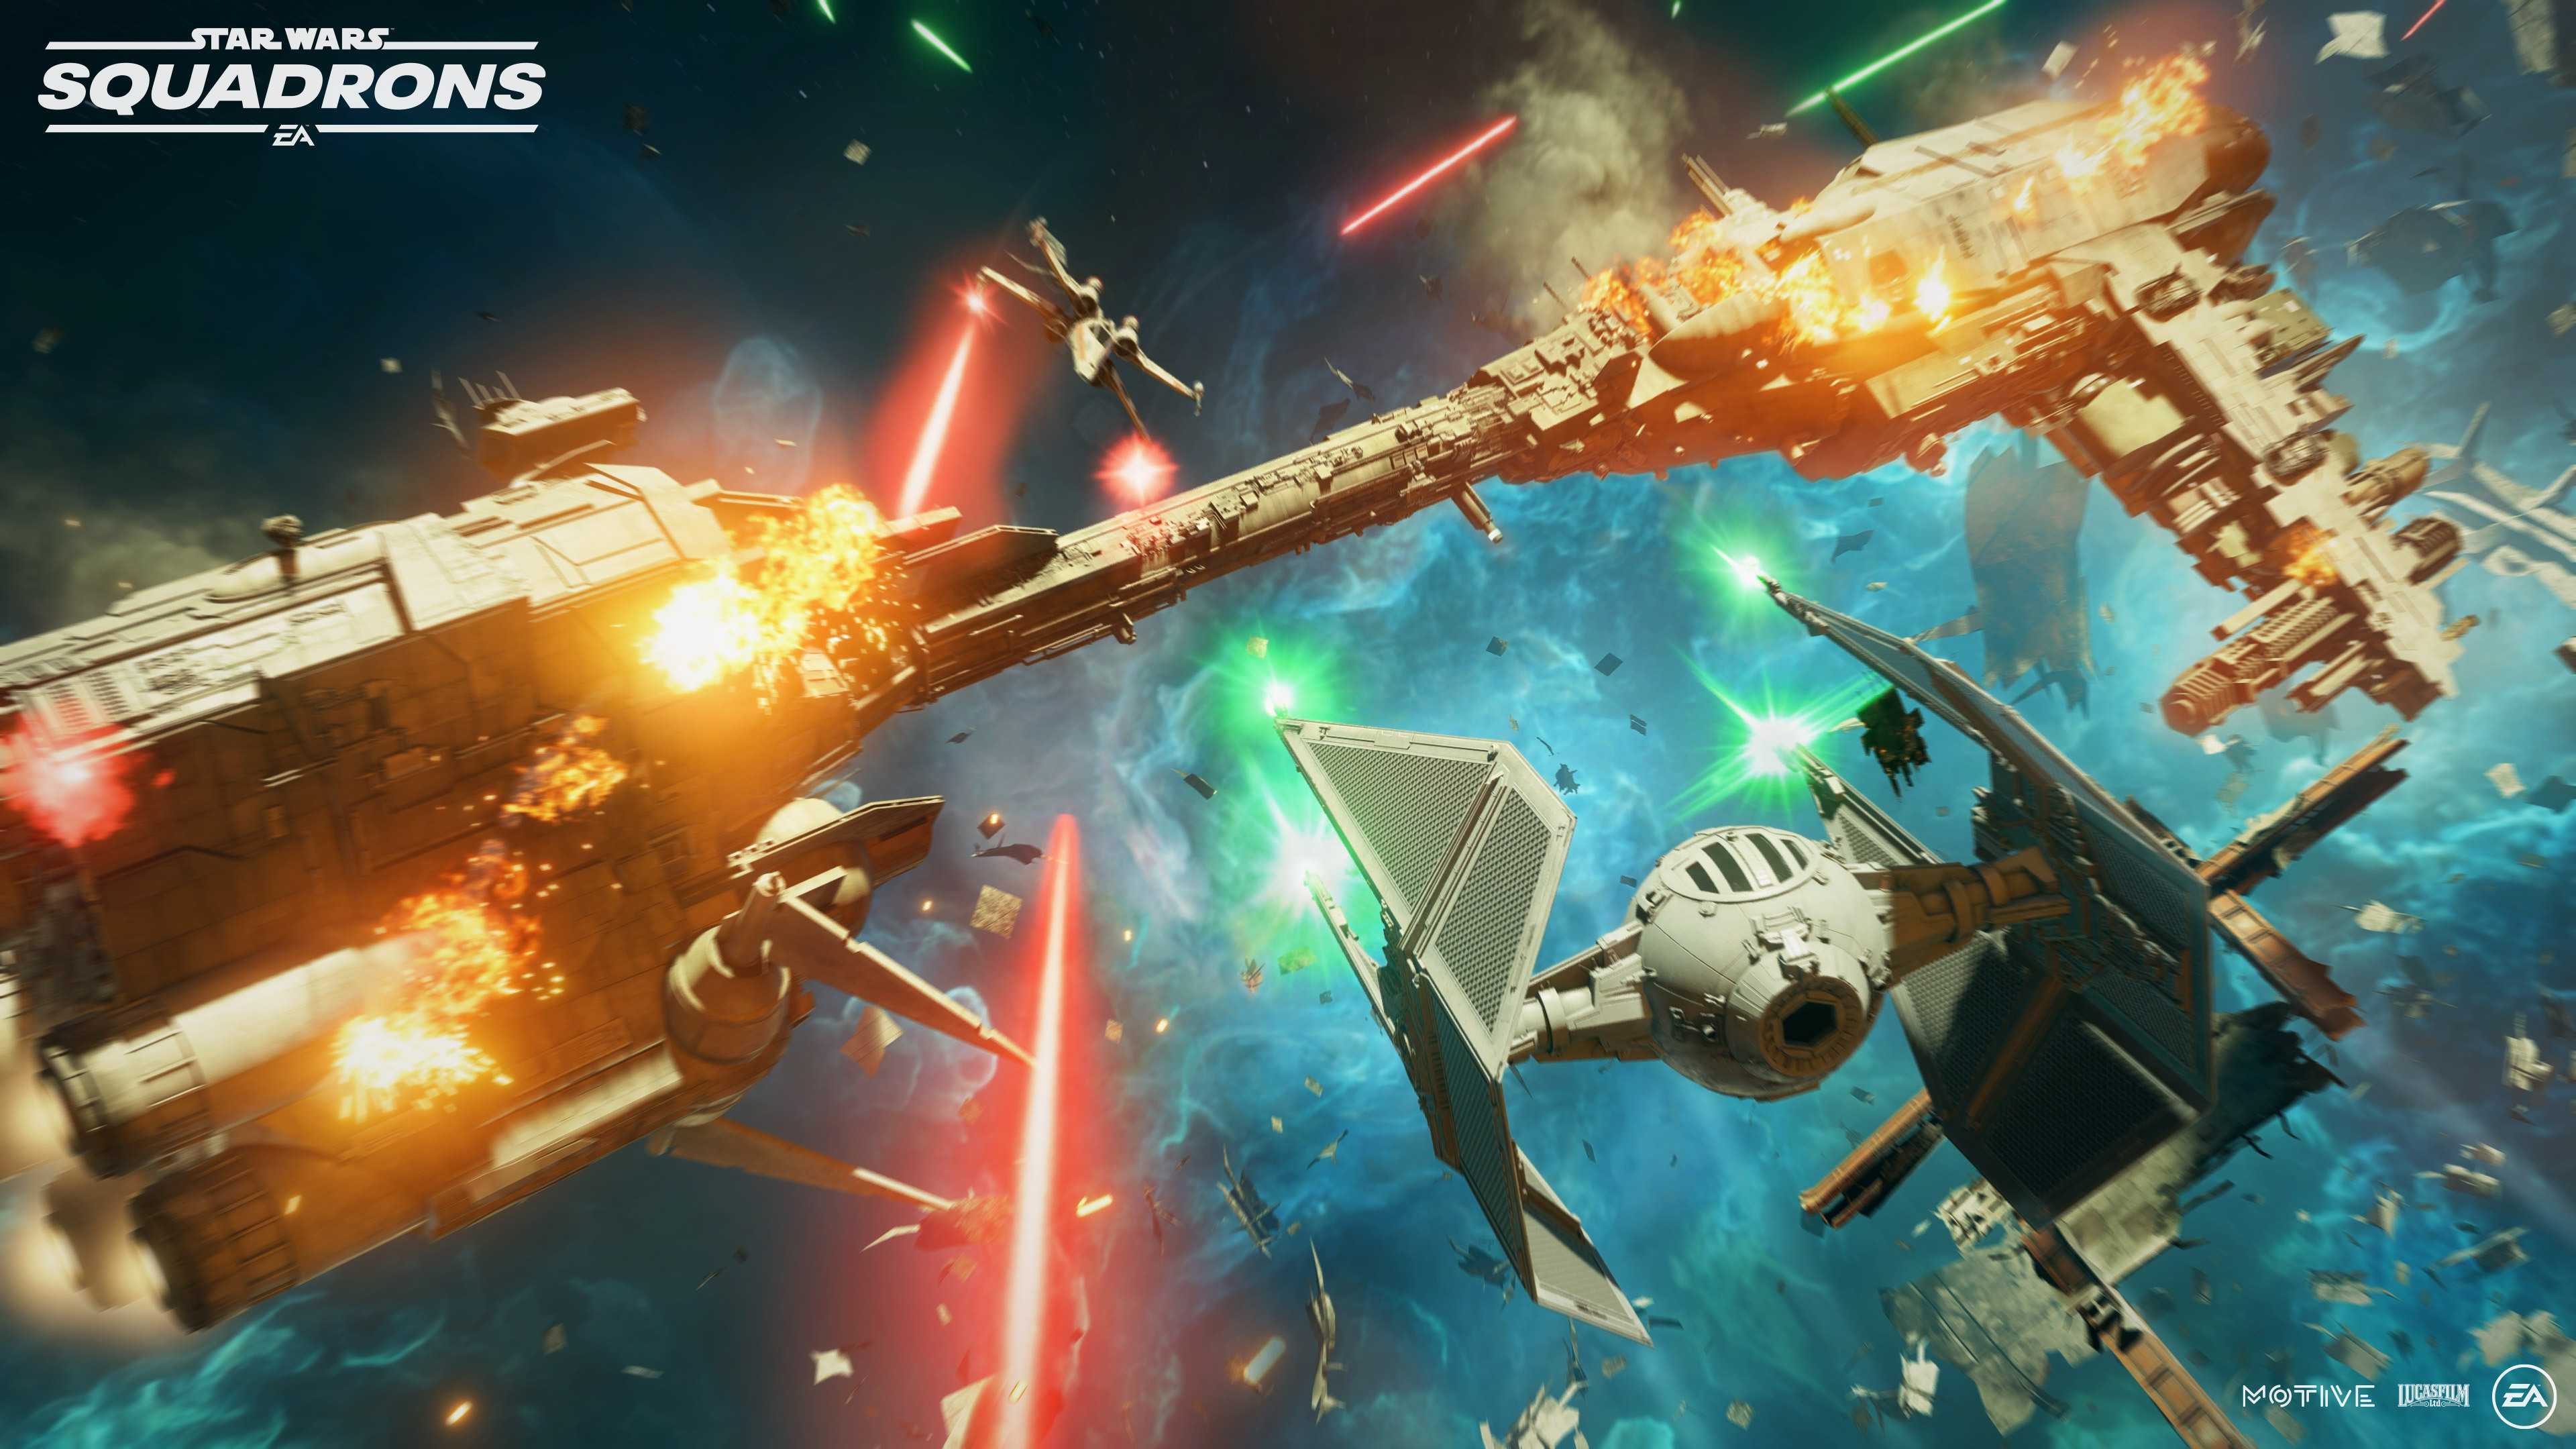 Star Wars: Squadrons first impressions | CNN Underscored